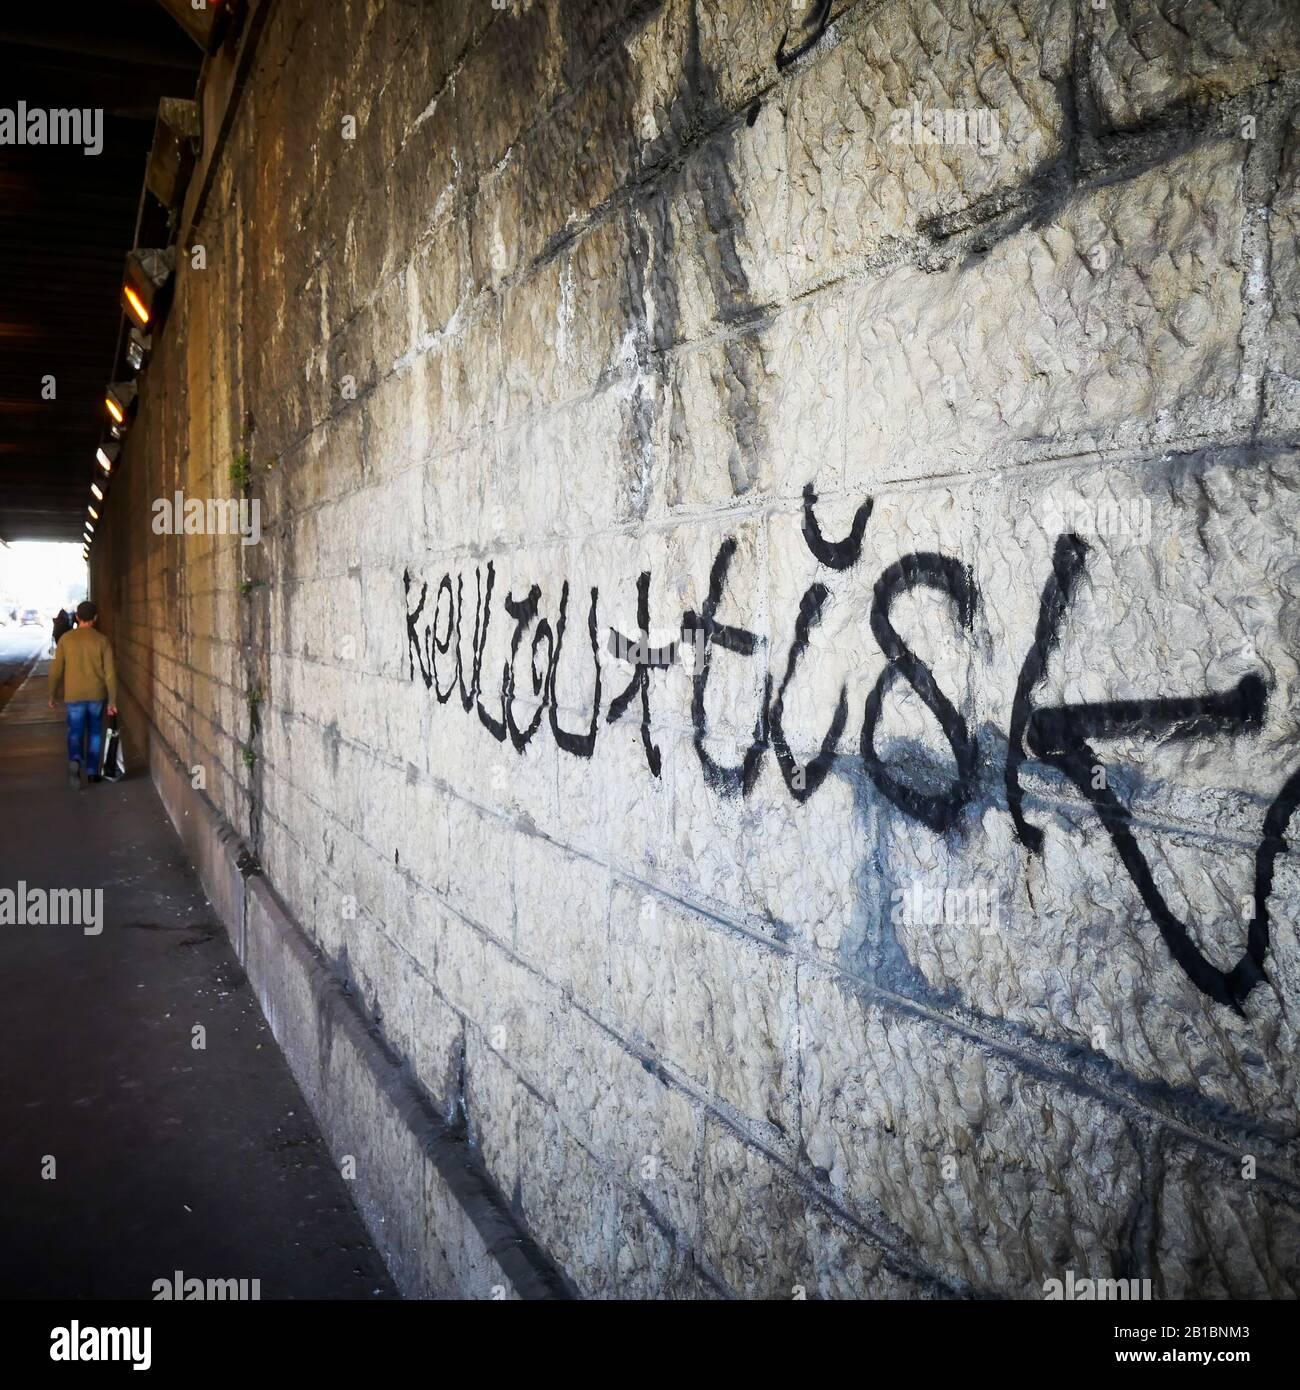 Stone wall with a graffiti, Lyon, France Stock Photo